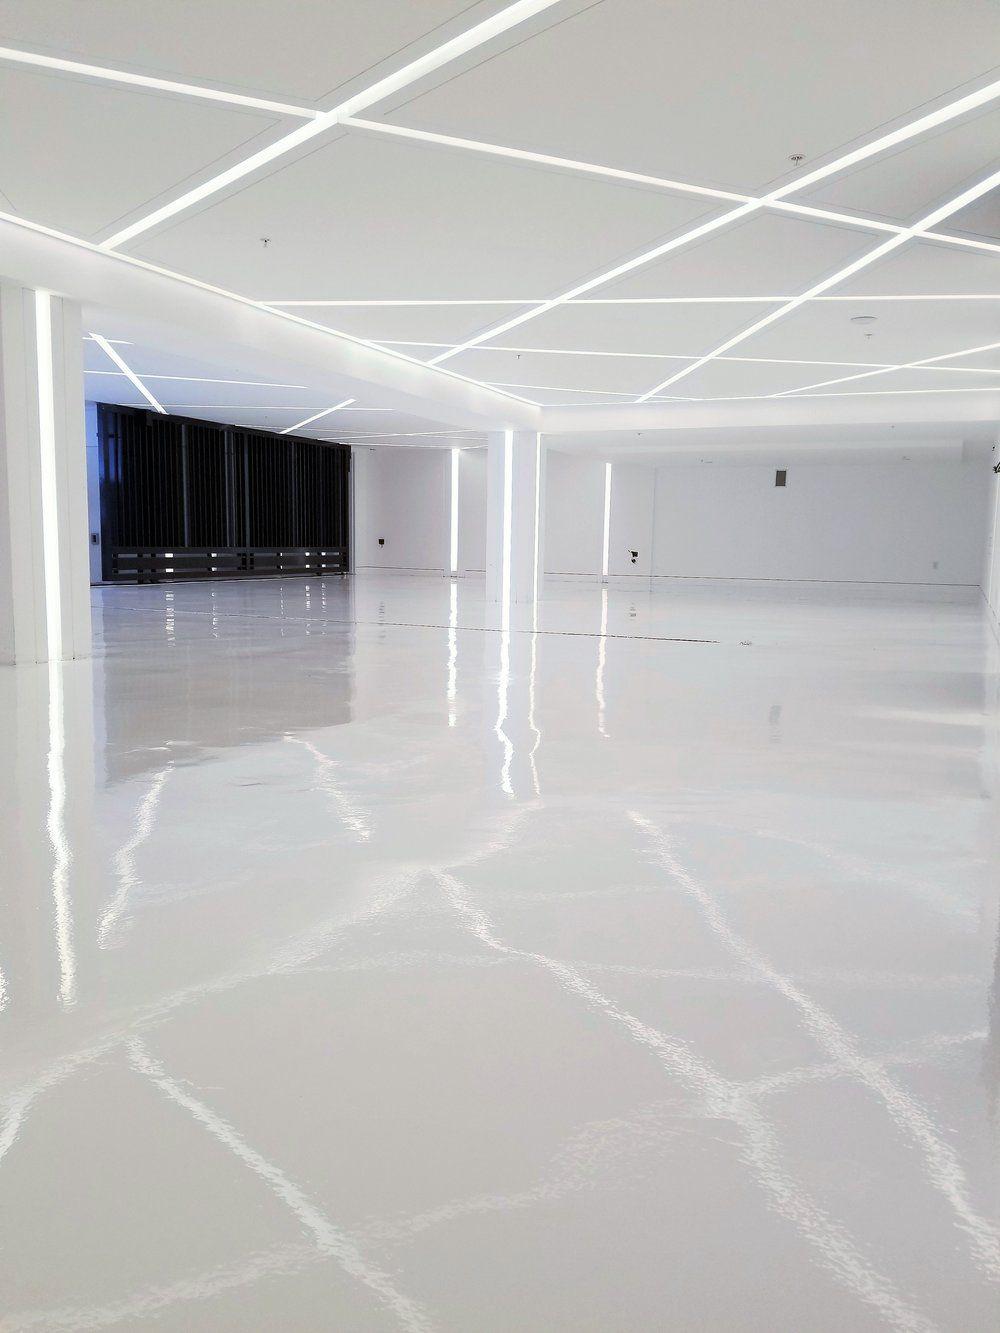 Pin by mike cortez on epoxy floor Epoxy floor, Garage